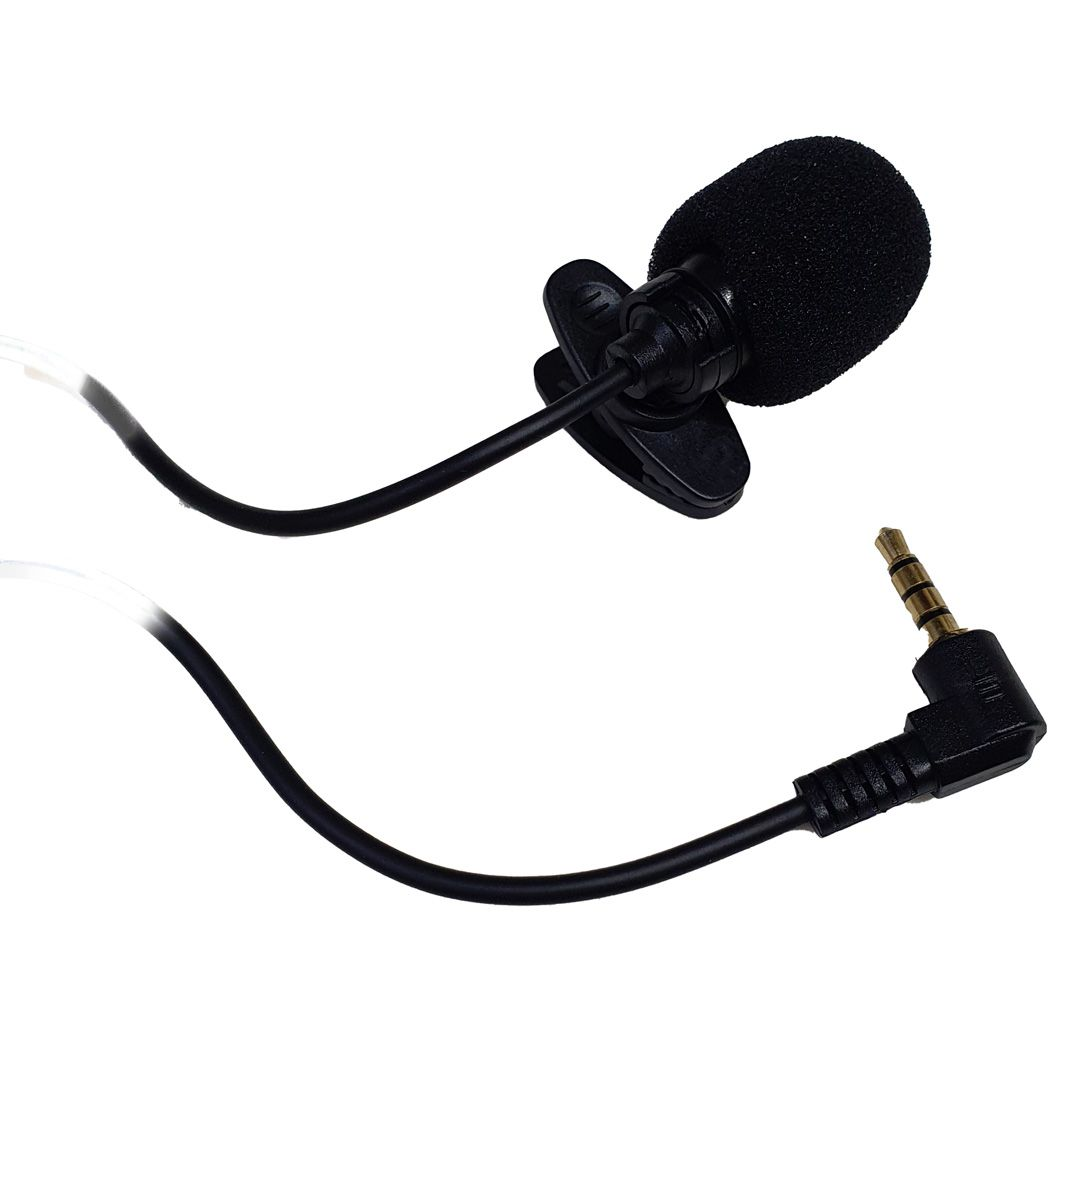 Microfone de Lapela para celular Android P3 Stereo 2m de cabo